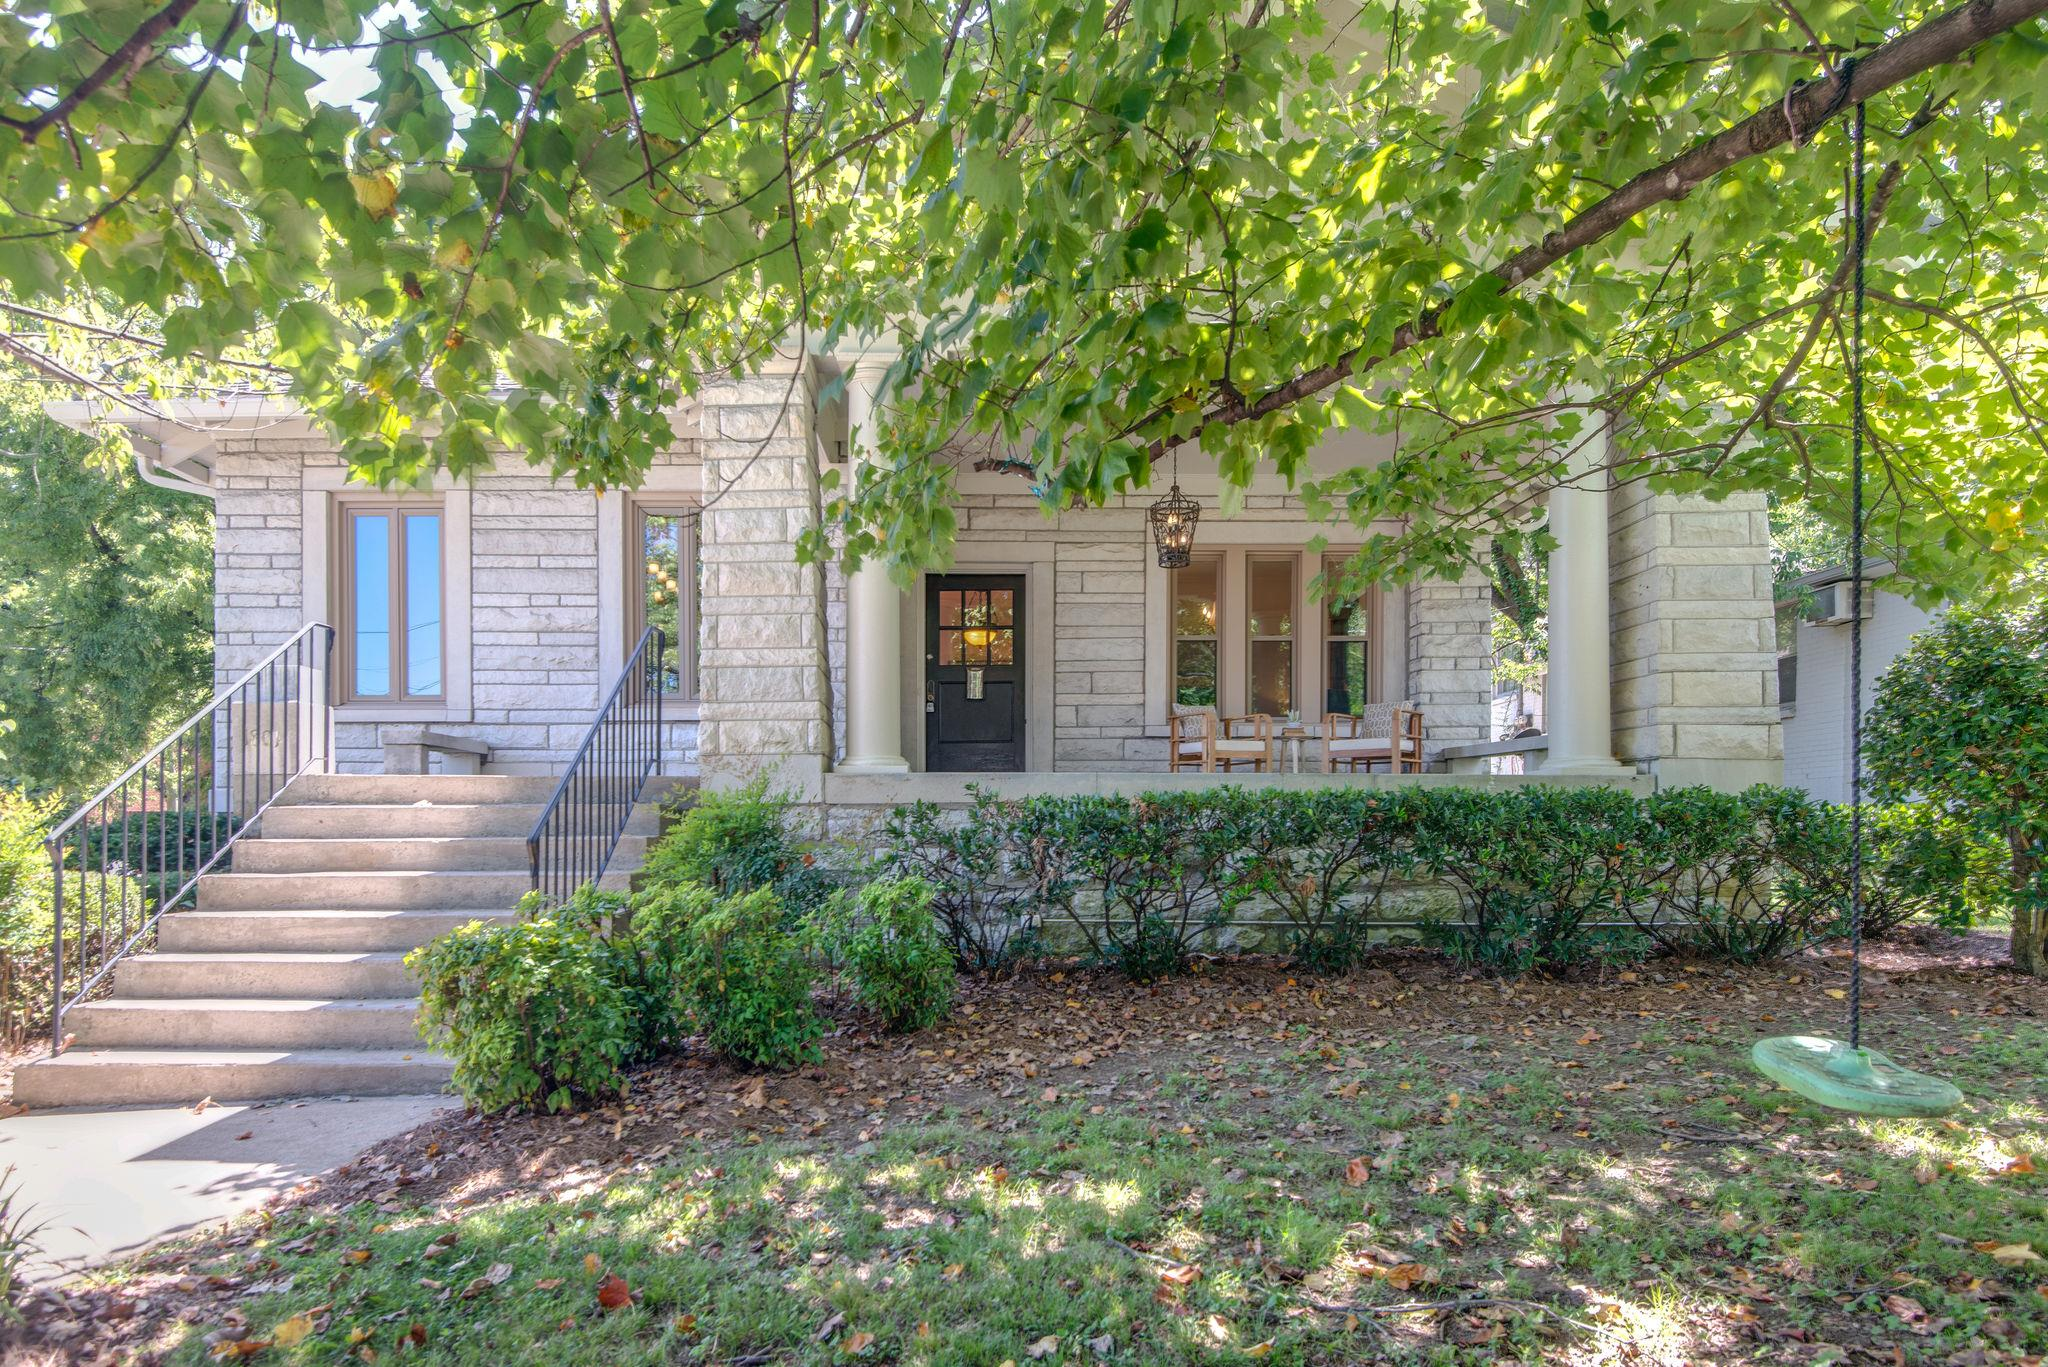 1801 Blair Blvd, Nashville, TN 37212 - Nashville, TN real estate listing